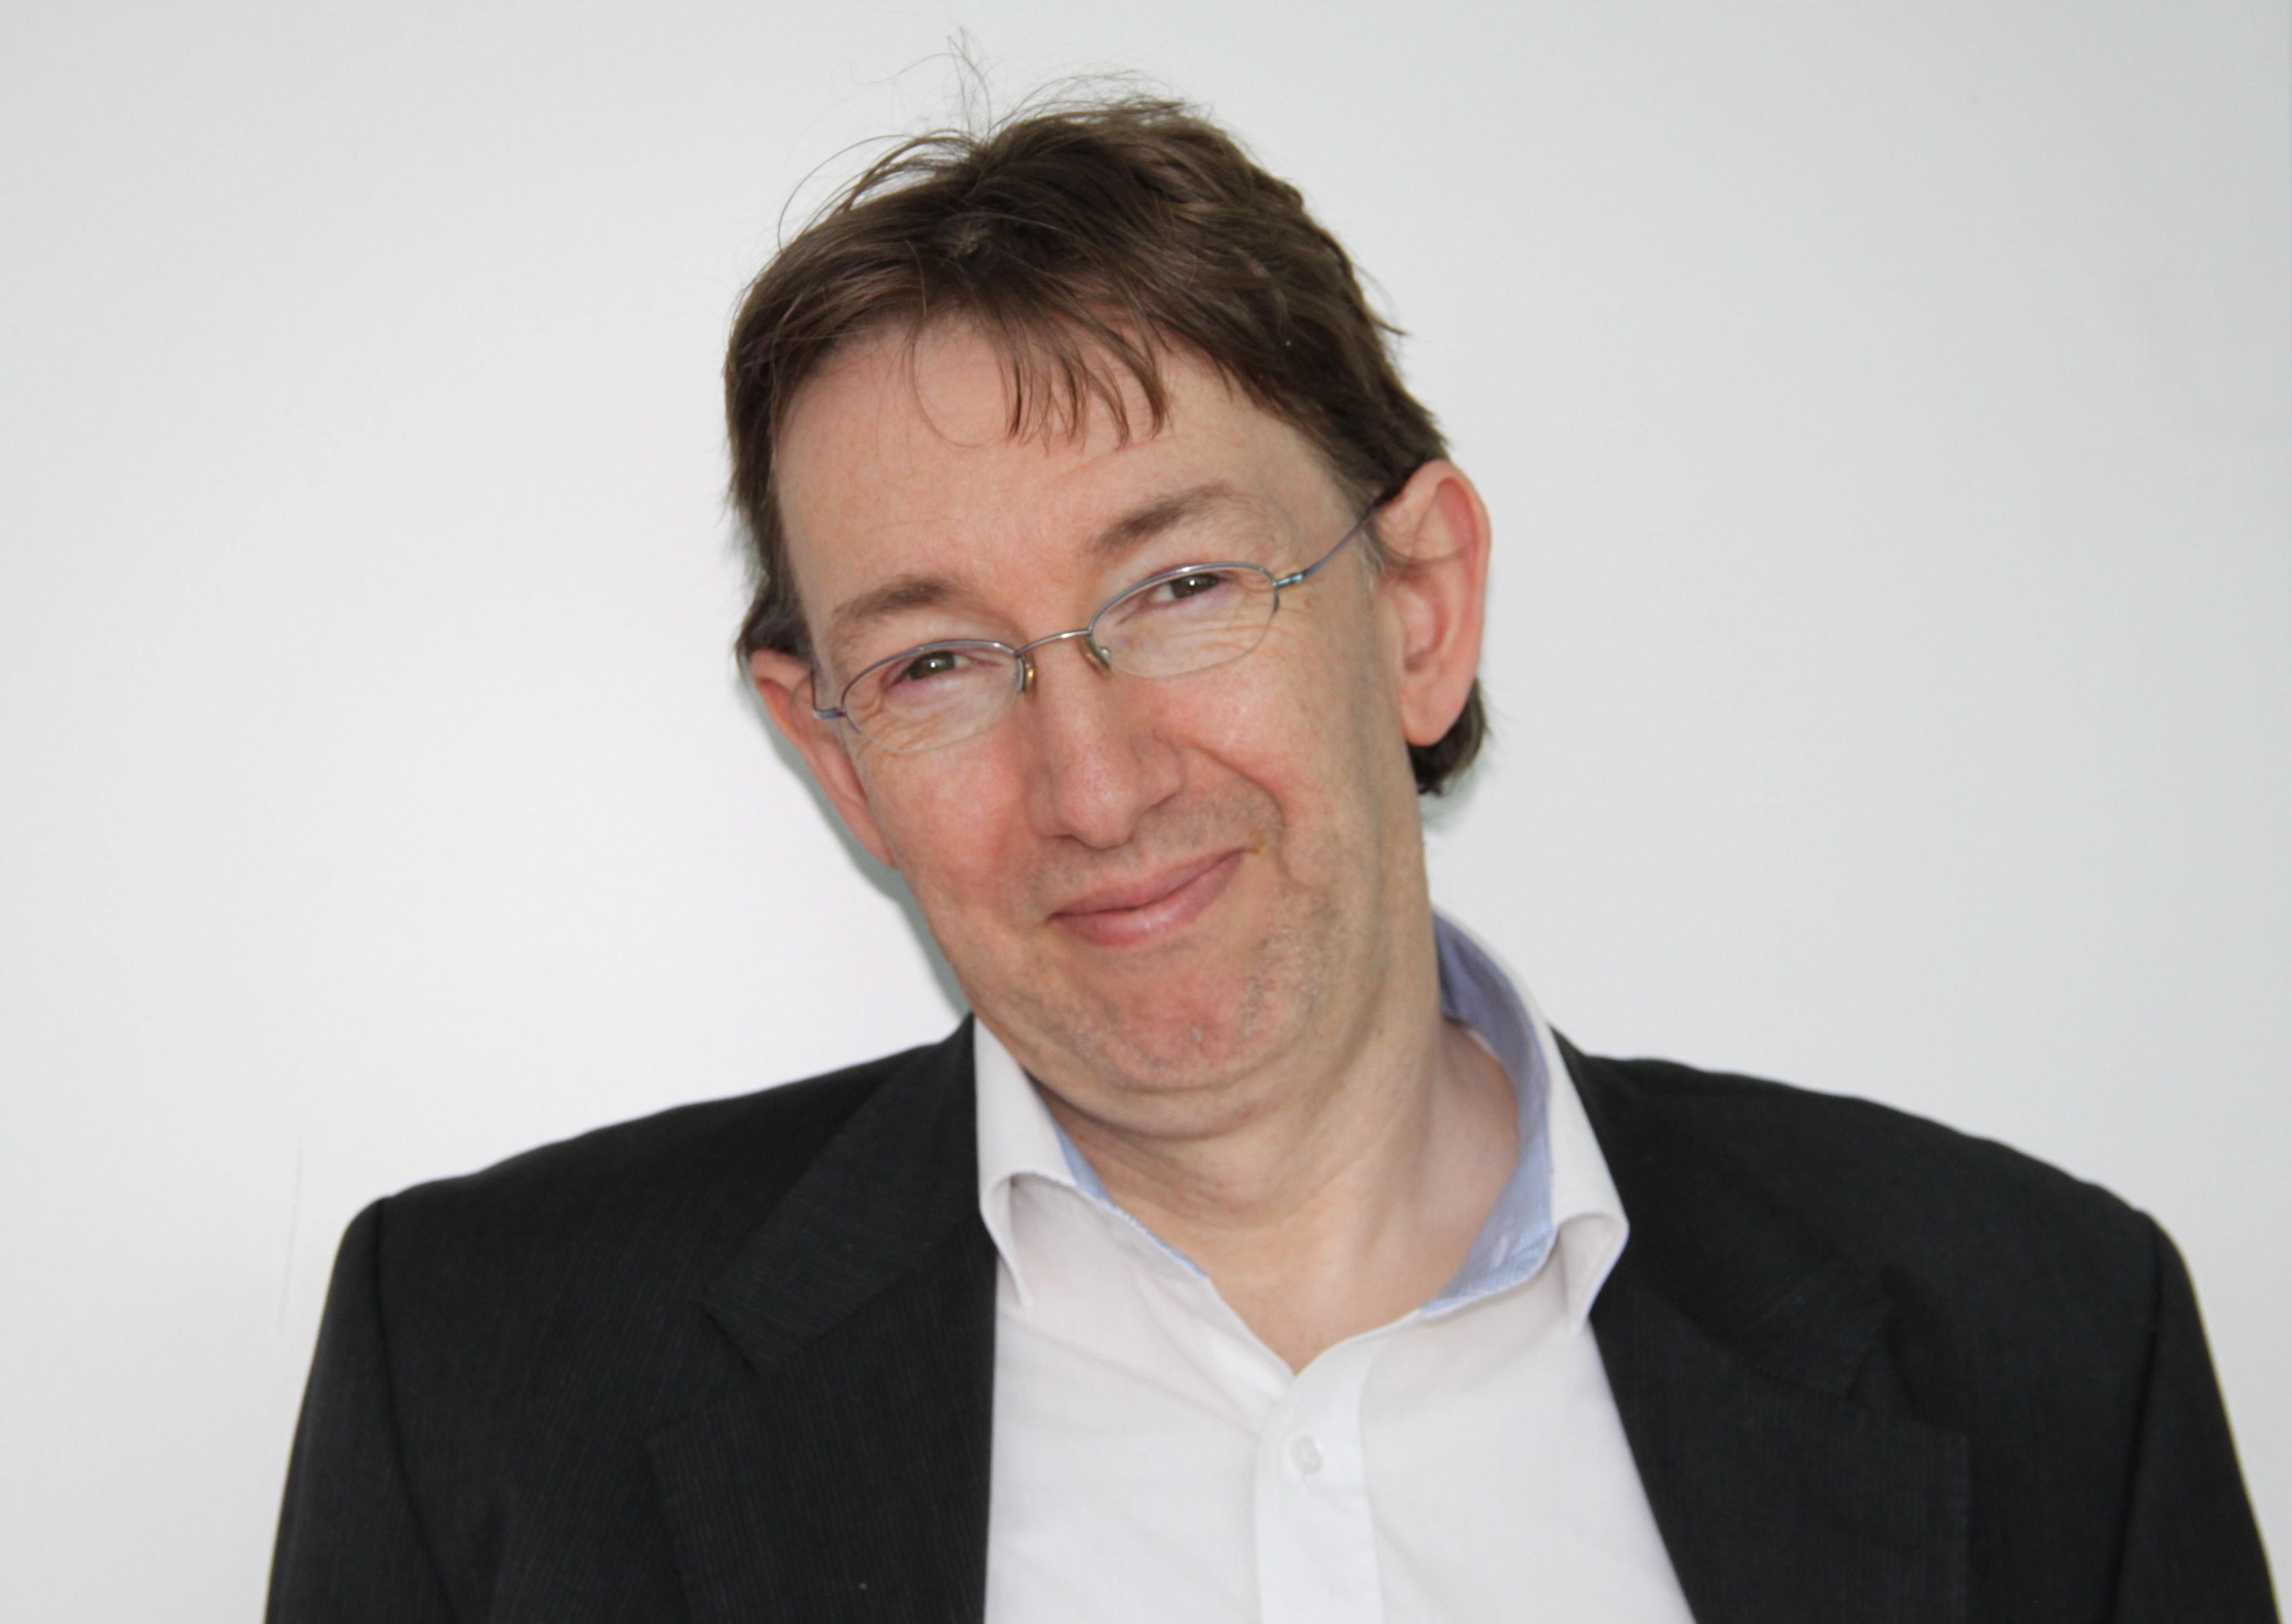 Dr. Sebastian Broecker